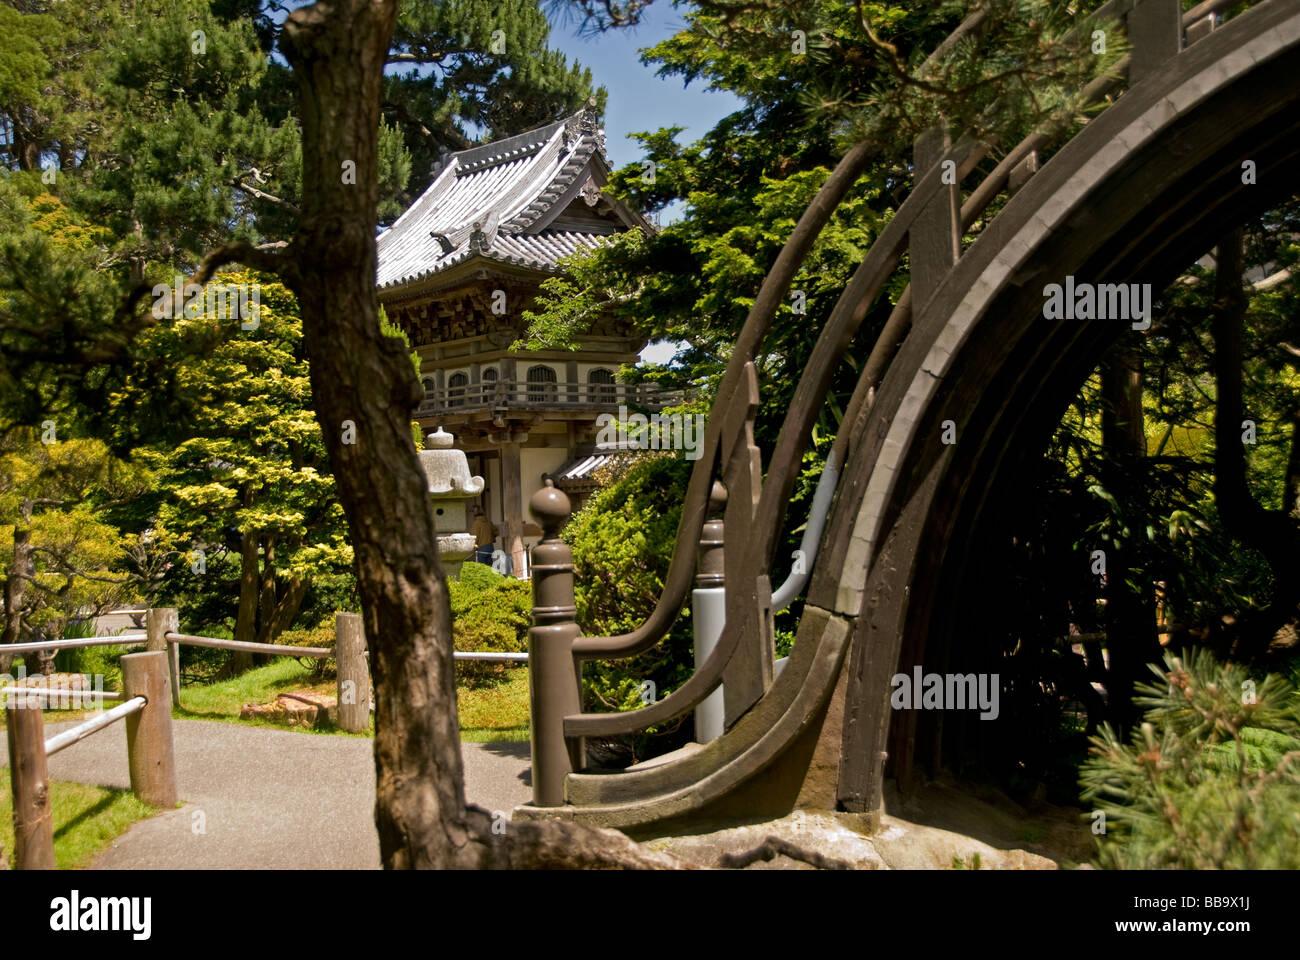 Golden Gate Park California Stock Photos & Golden Gate Park ...